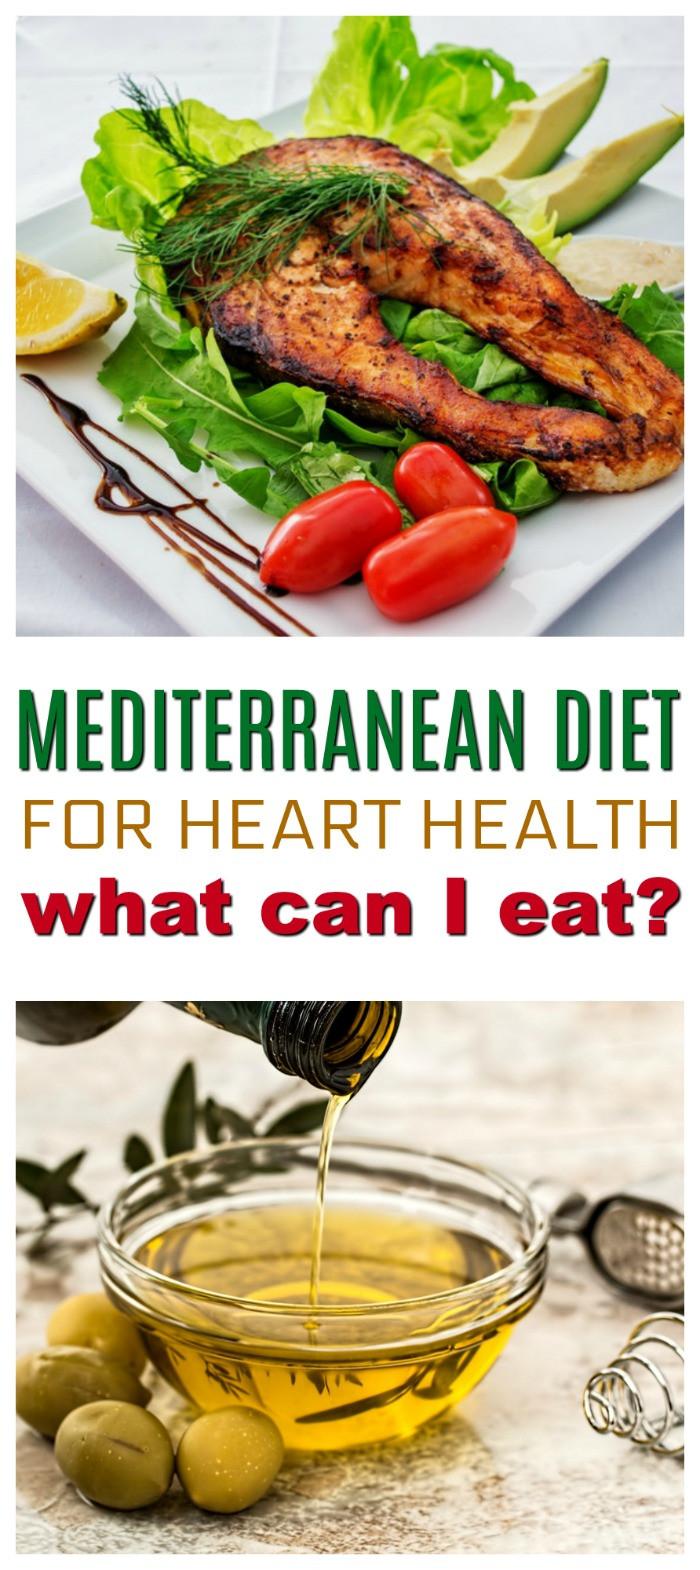 Heart Healthy Mediterranean Diet  How to Follow the Mediterranean Diet for Heart Health and